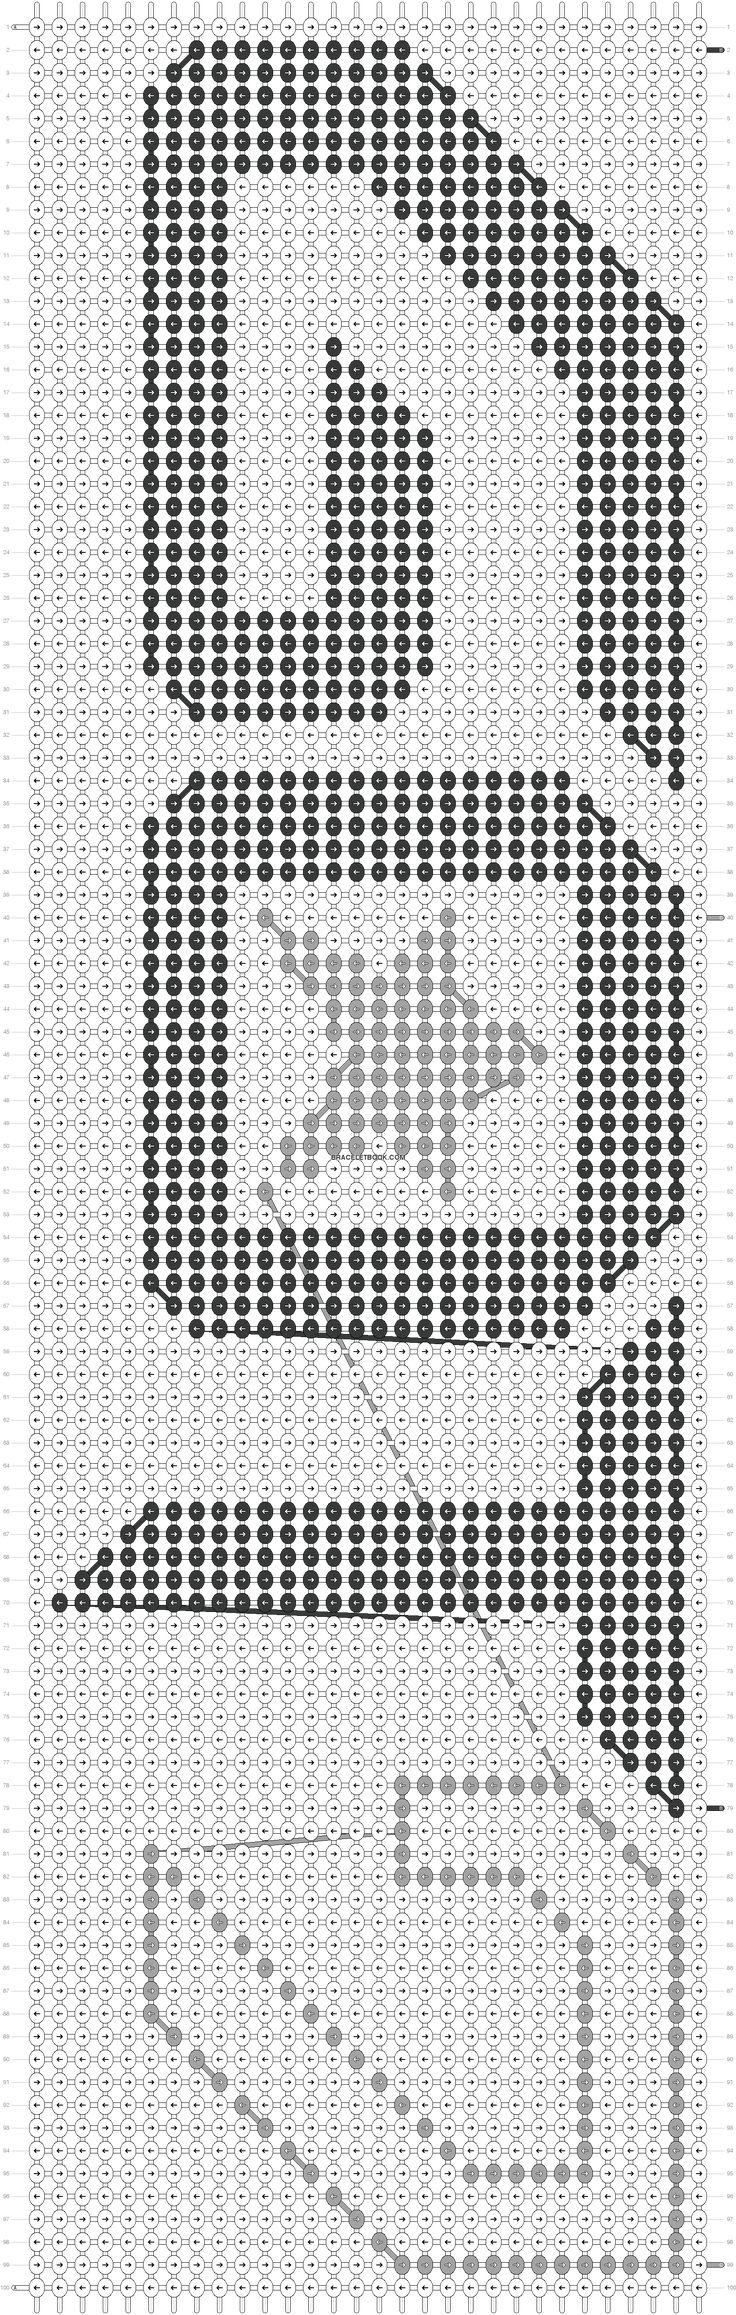 Alpha Pattern #13166 added by Starlet